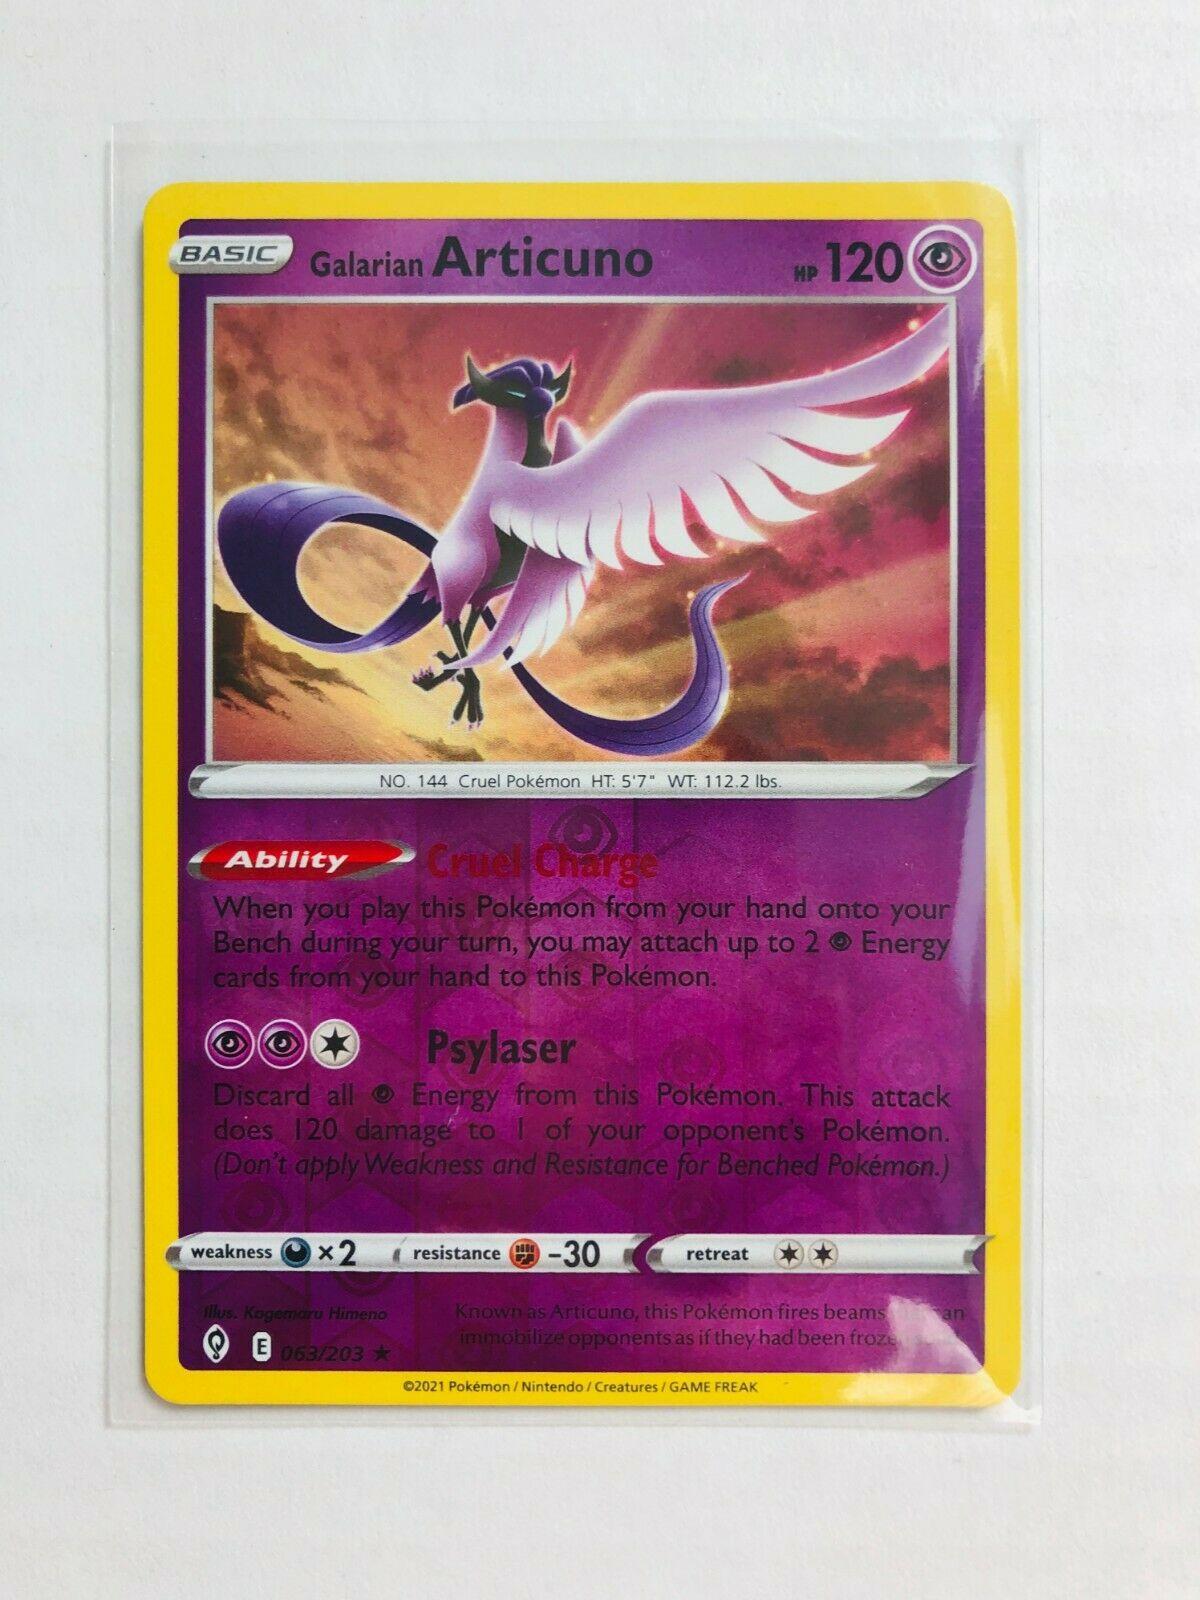 Pokemon - Galarian Articuno - Evolving Skies - 063/203 - Reverse Holo Rare